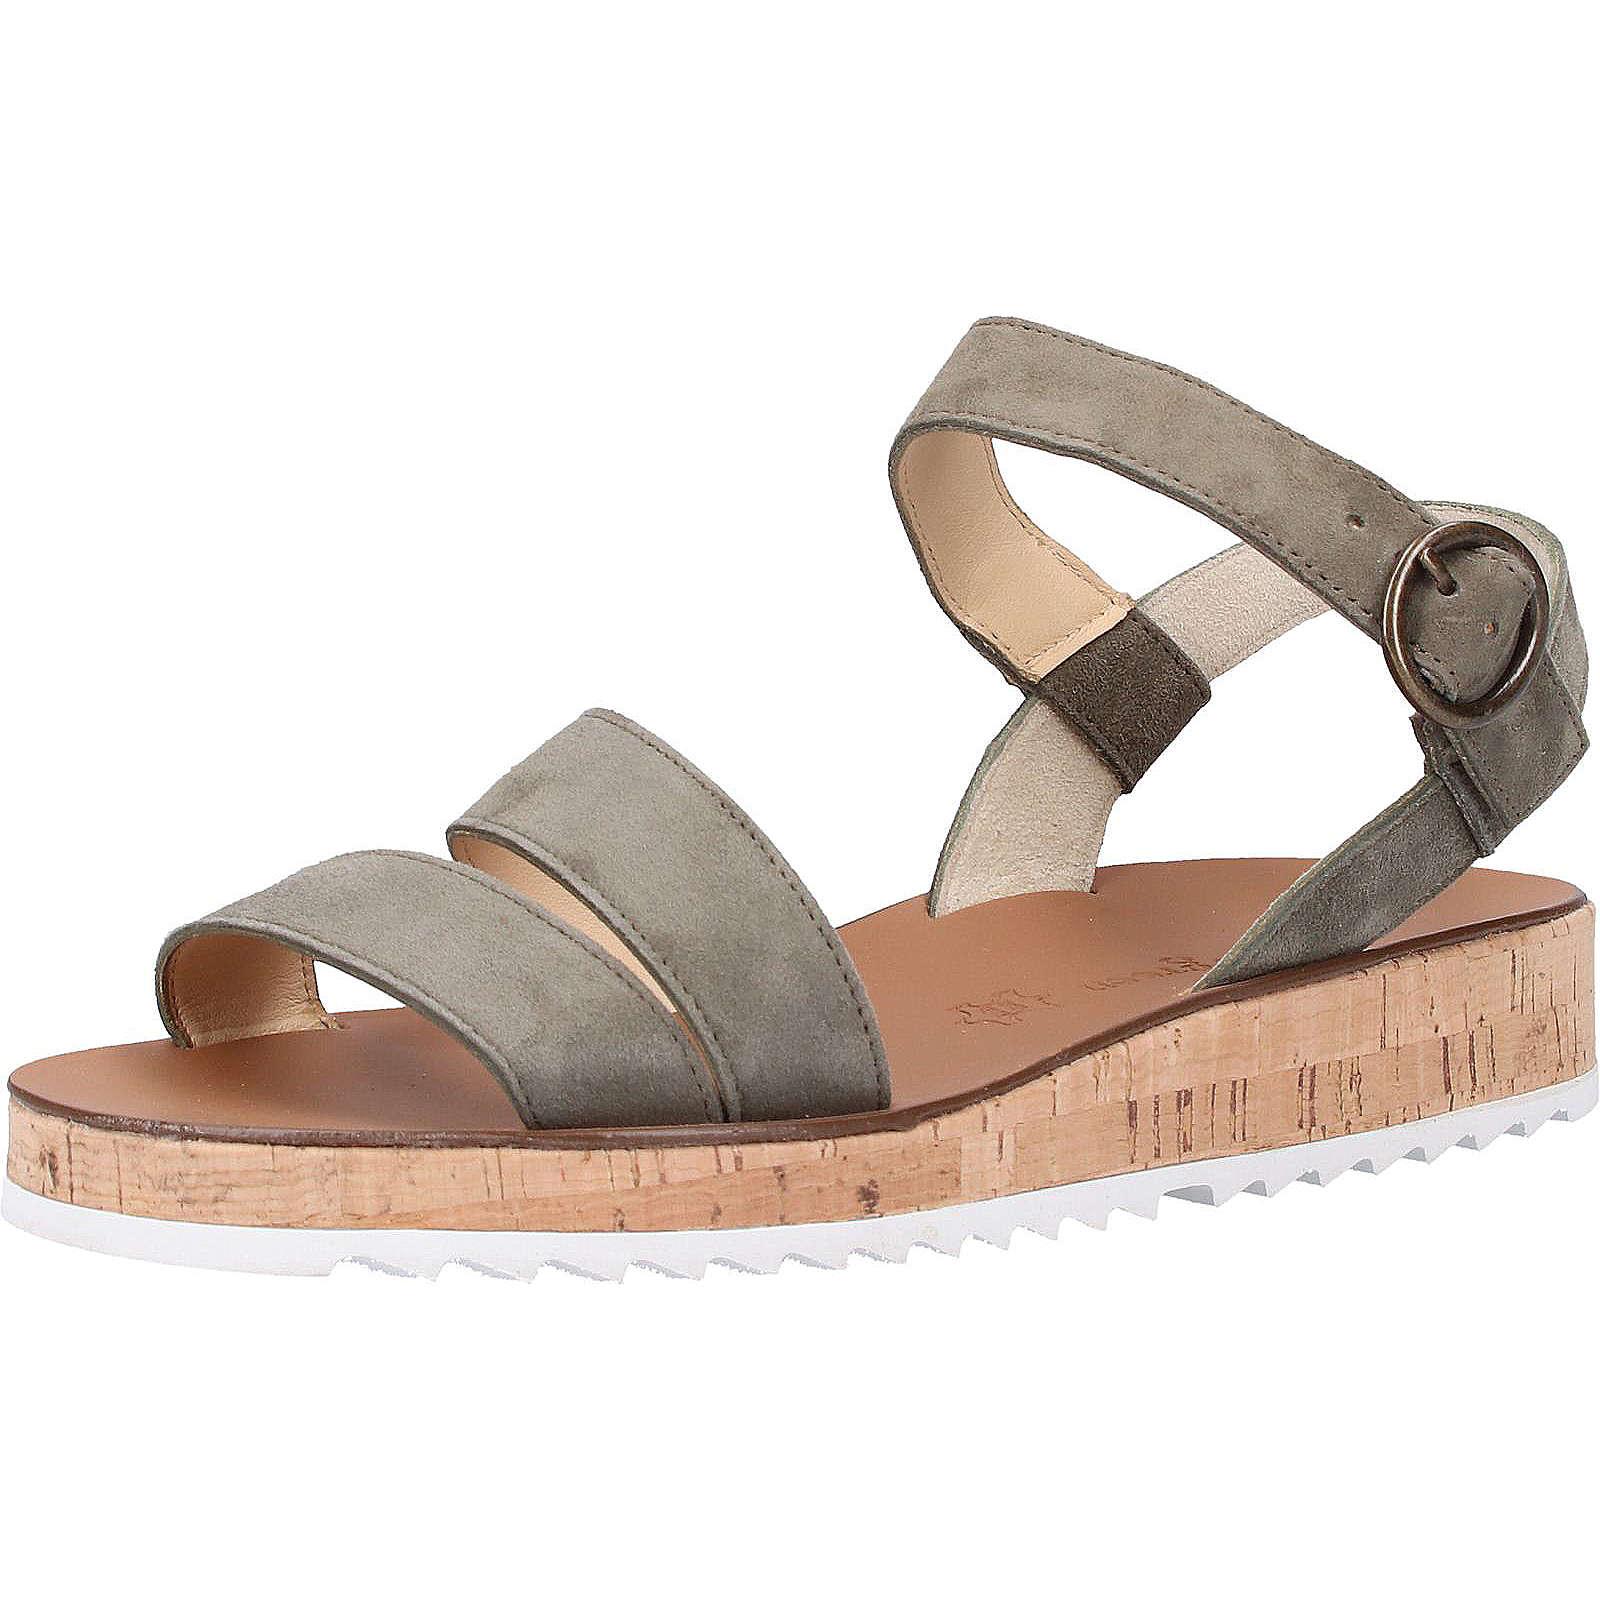 Paul Green Sandalen Klassische Sandaletten khaki Damen Gr. 39